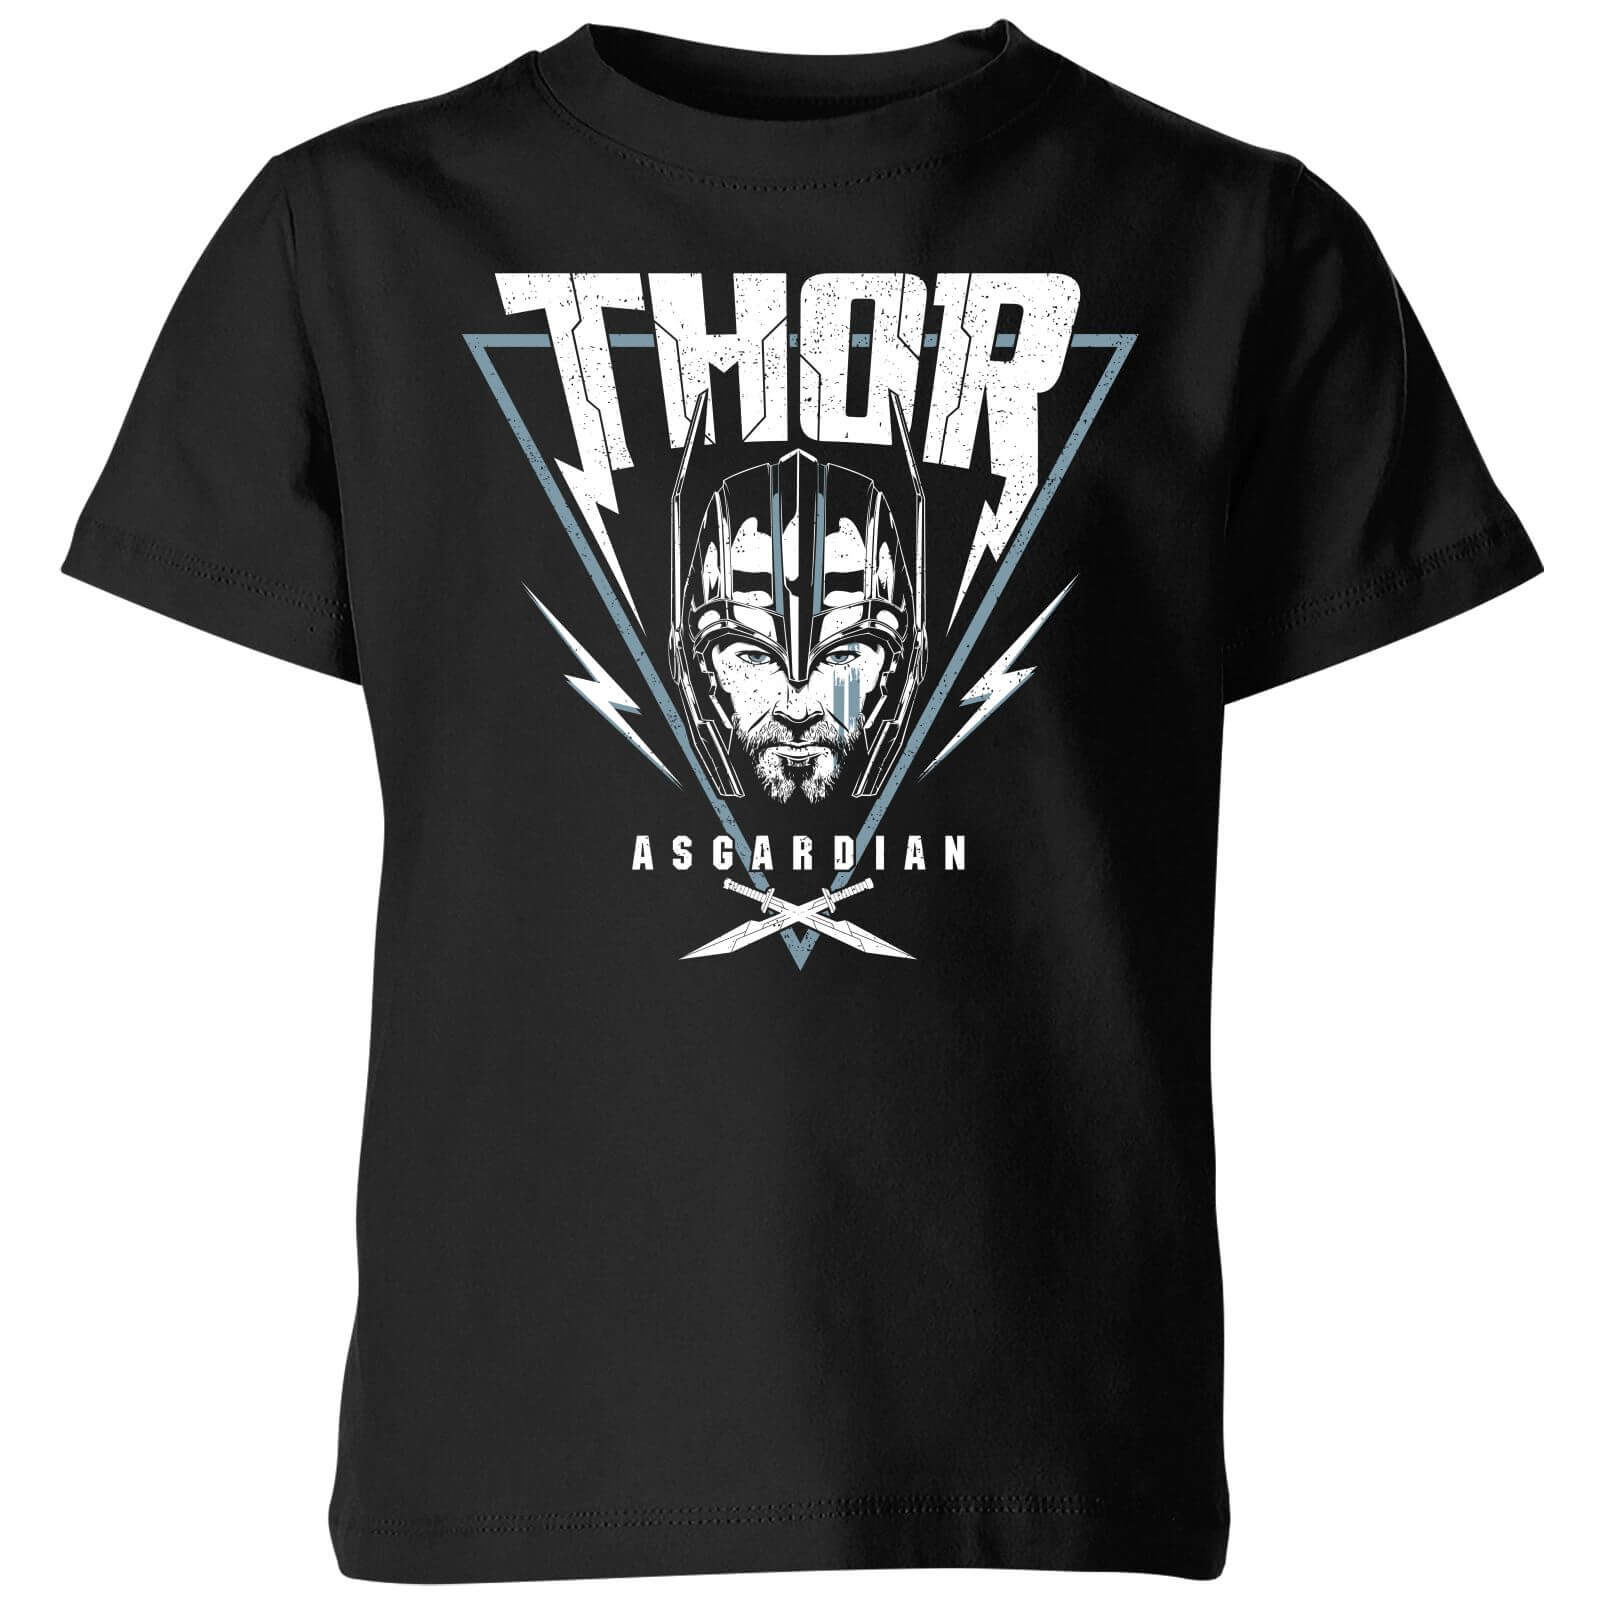 OfferteWeb.click 20-t-shirt-marvel-thor-ragnarok-asgardian-triangle-nero